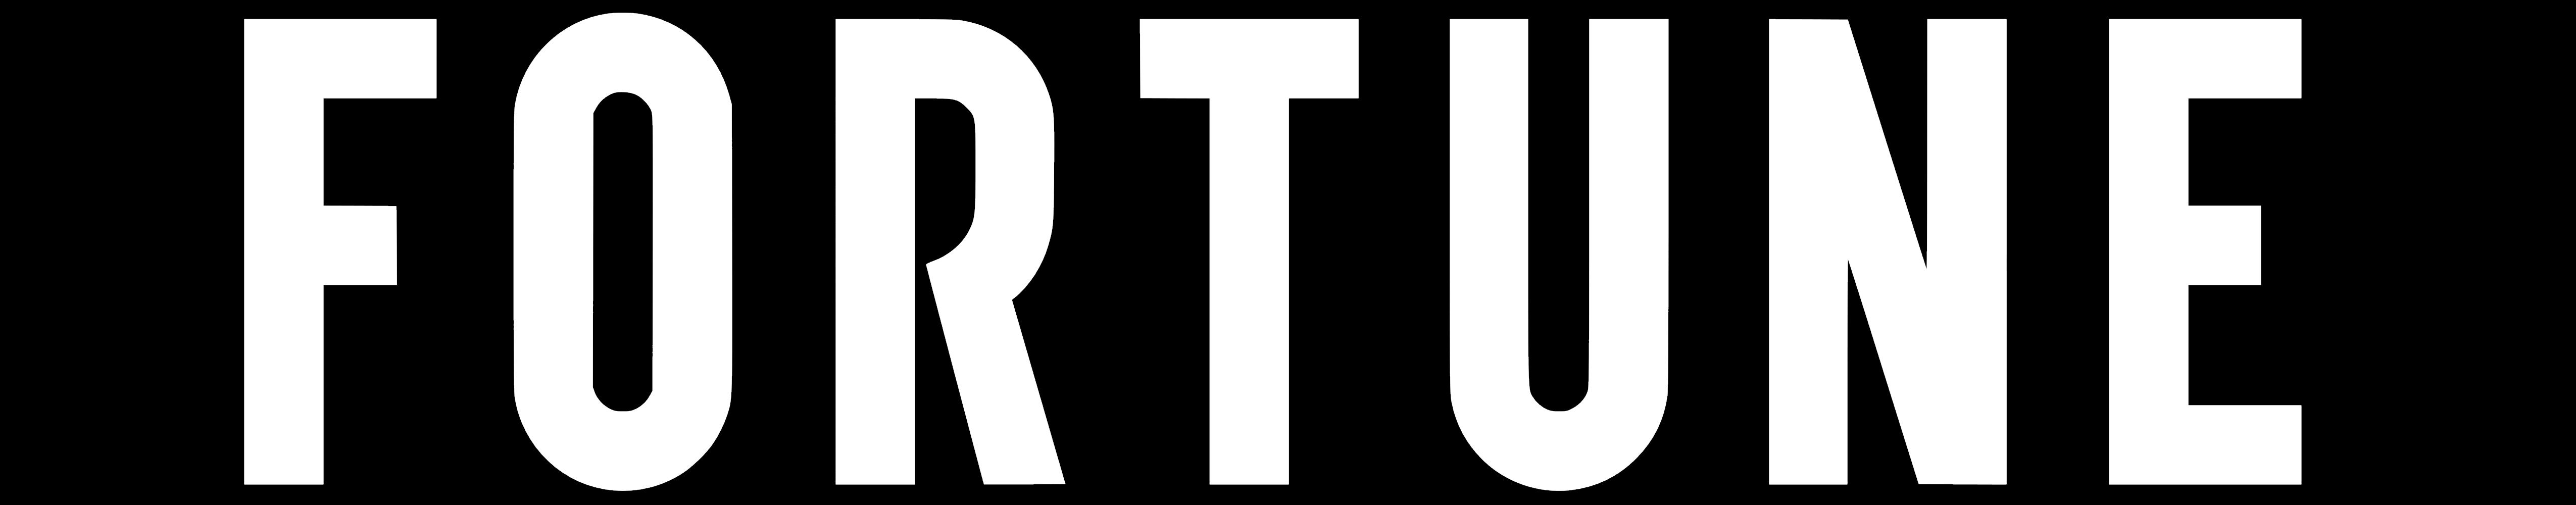 Image result for fortune logo image